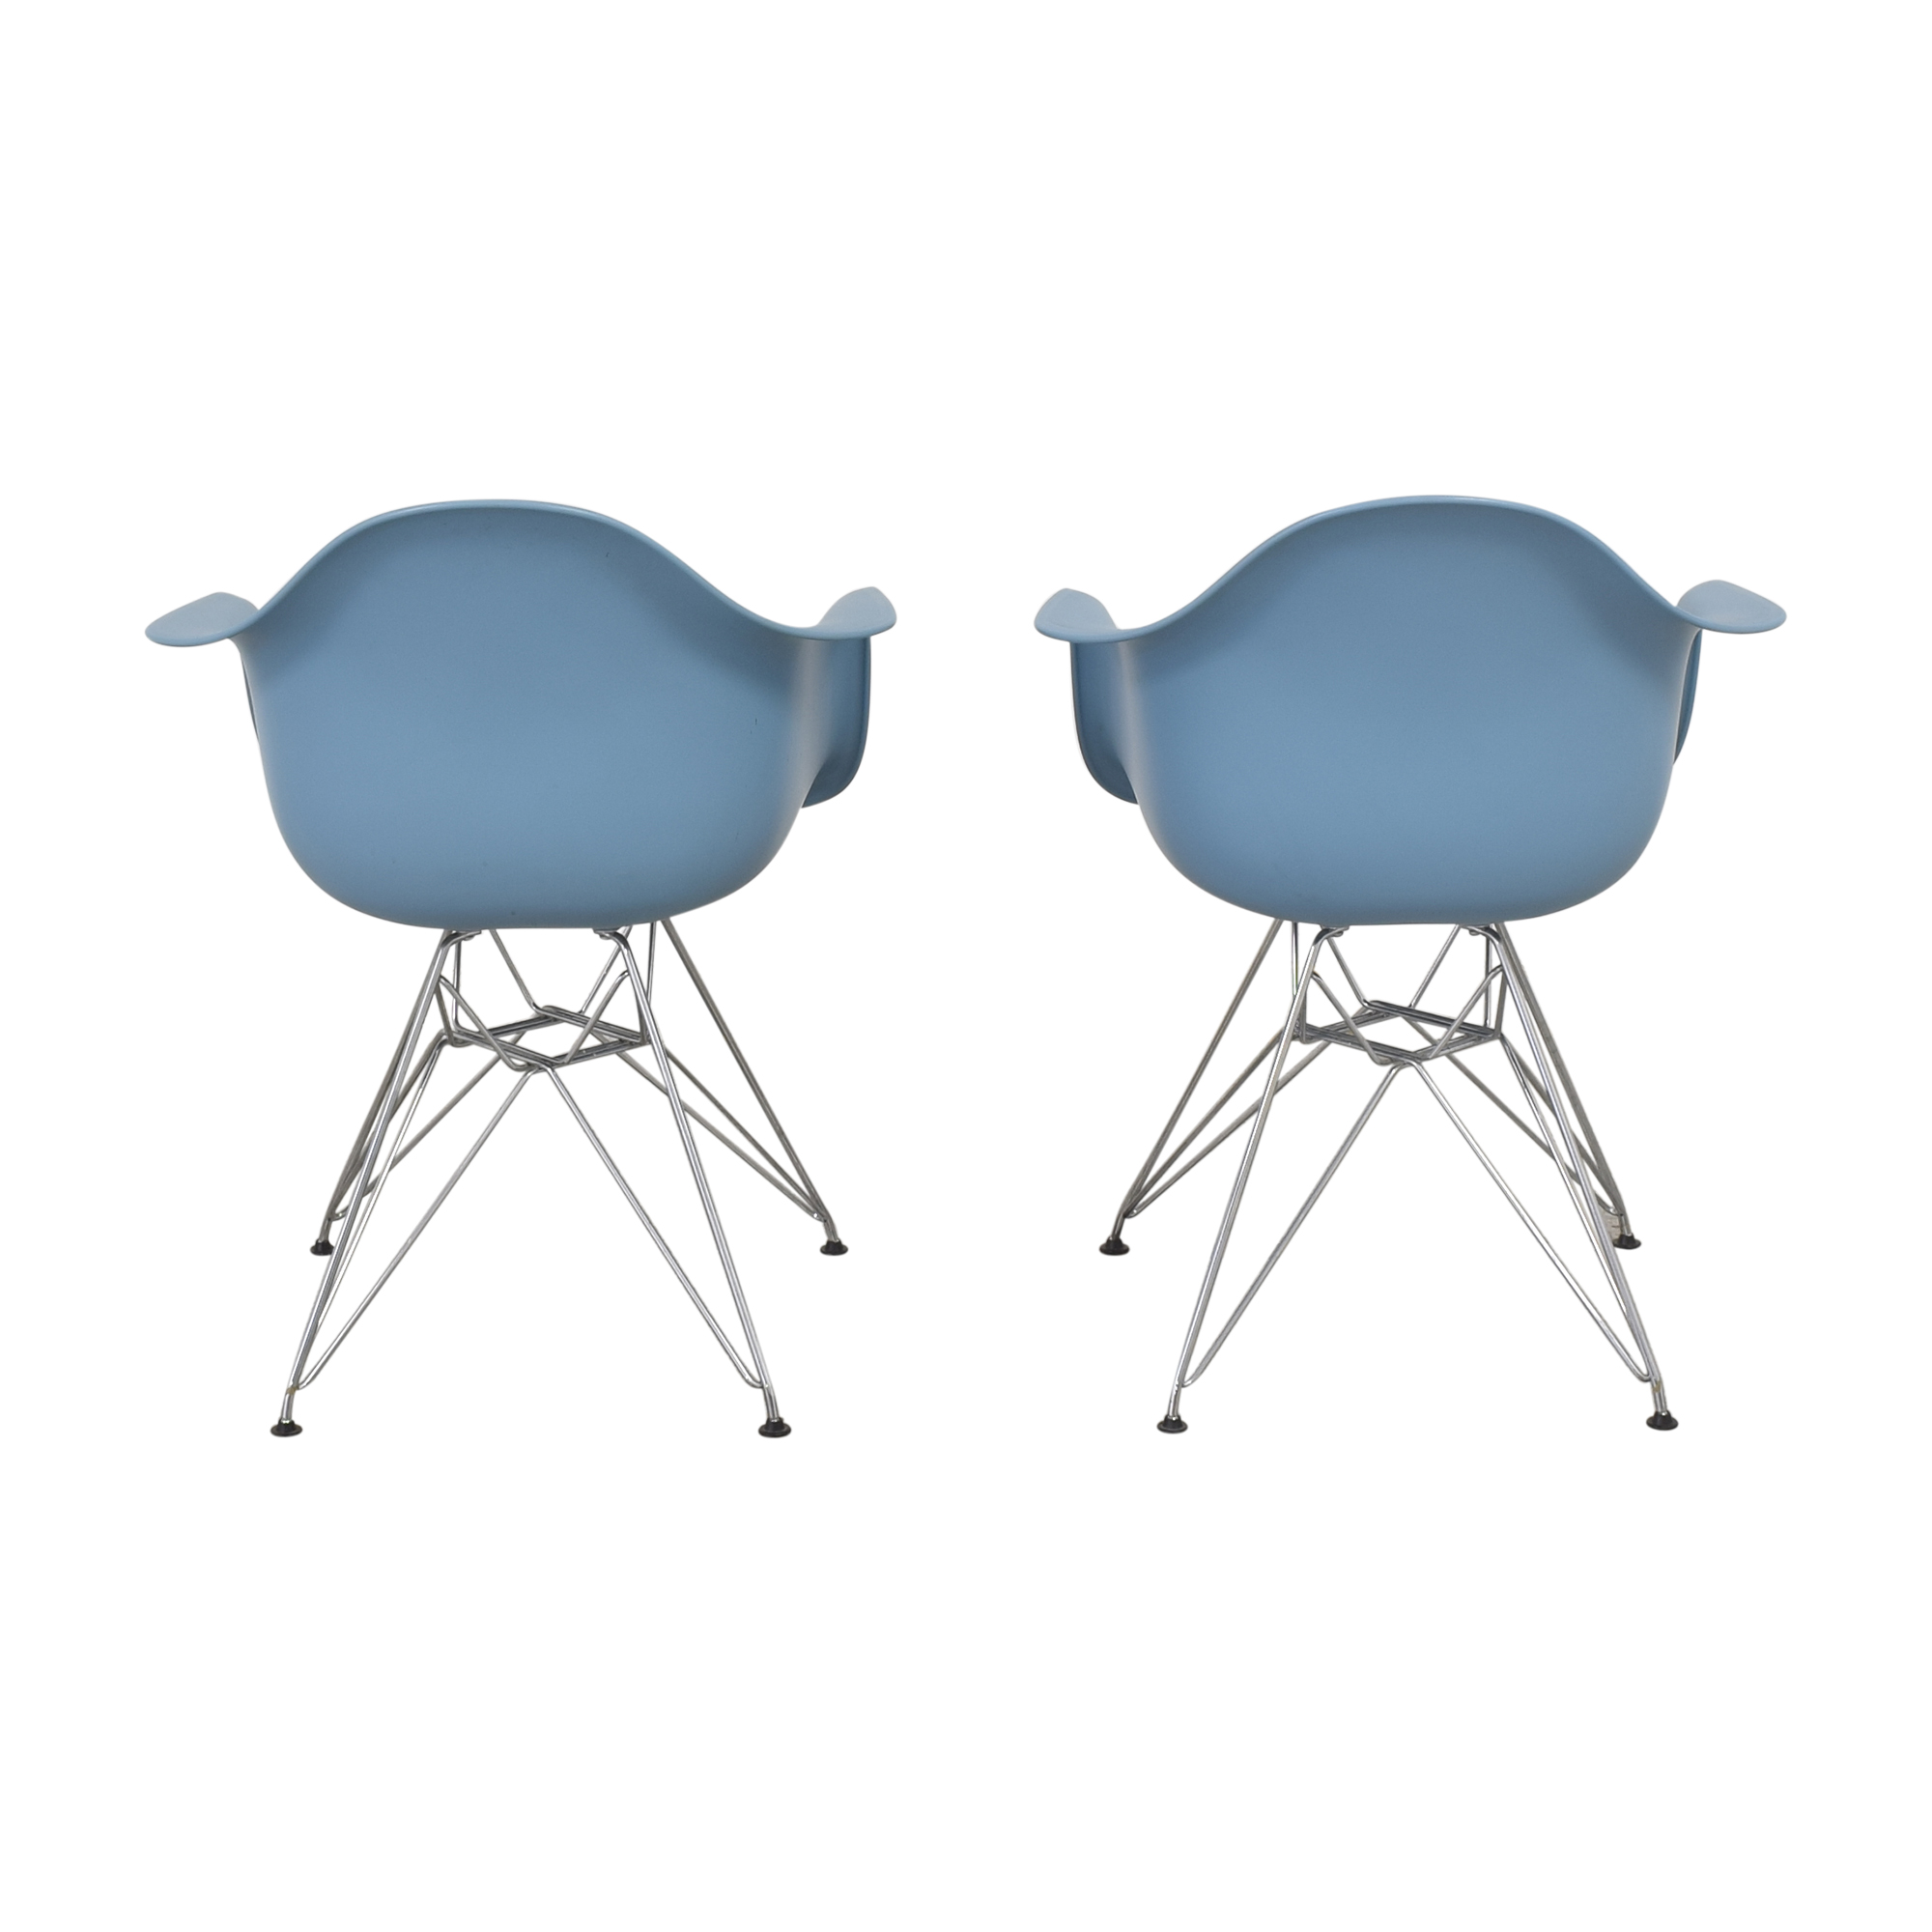 Herman Miller Herman Miller Eames Molded Armchairs on sale